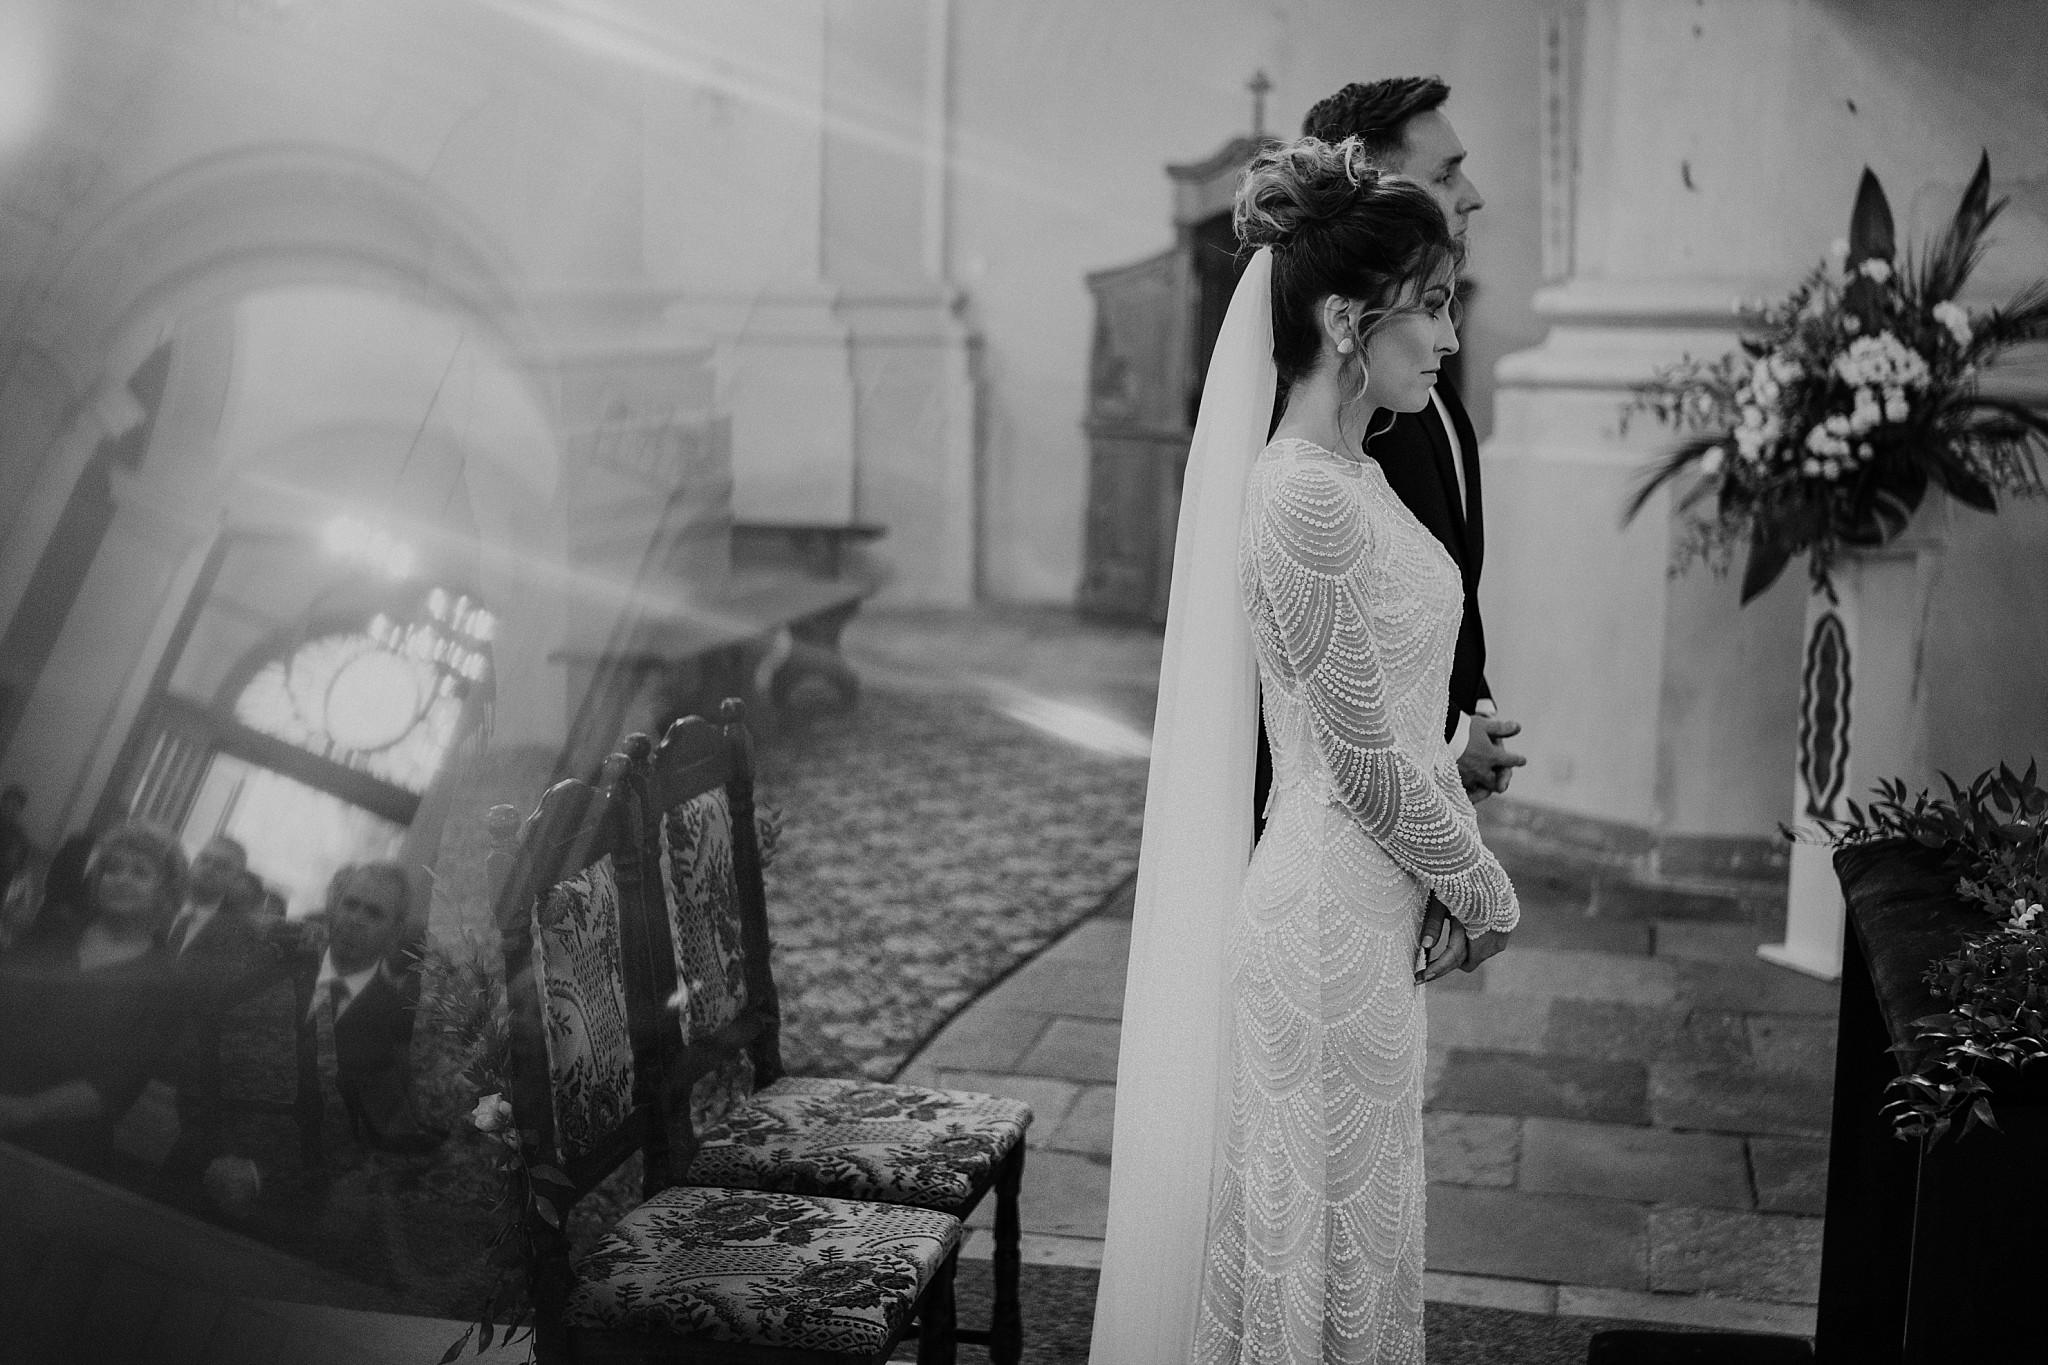 fotograf poznan wesele dobra truskawka piekne wesele pod poznaniem wesele w dobrej truskawce piekna para mloda slub marzen slub koronawirus slub listopad wesele koronawirus 192